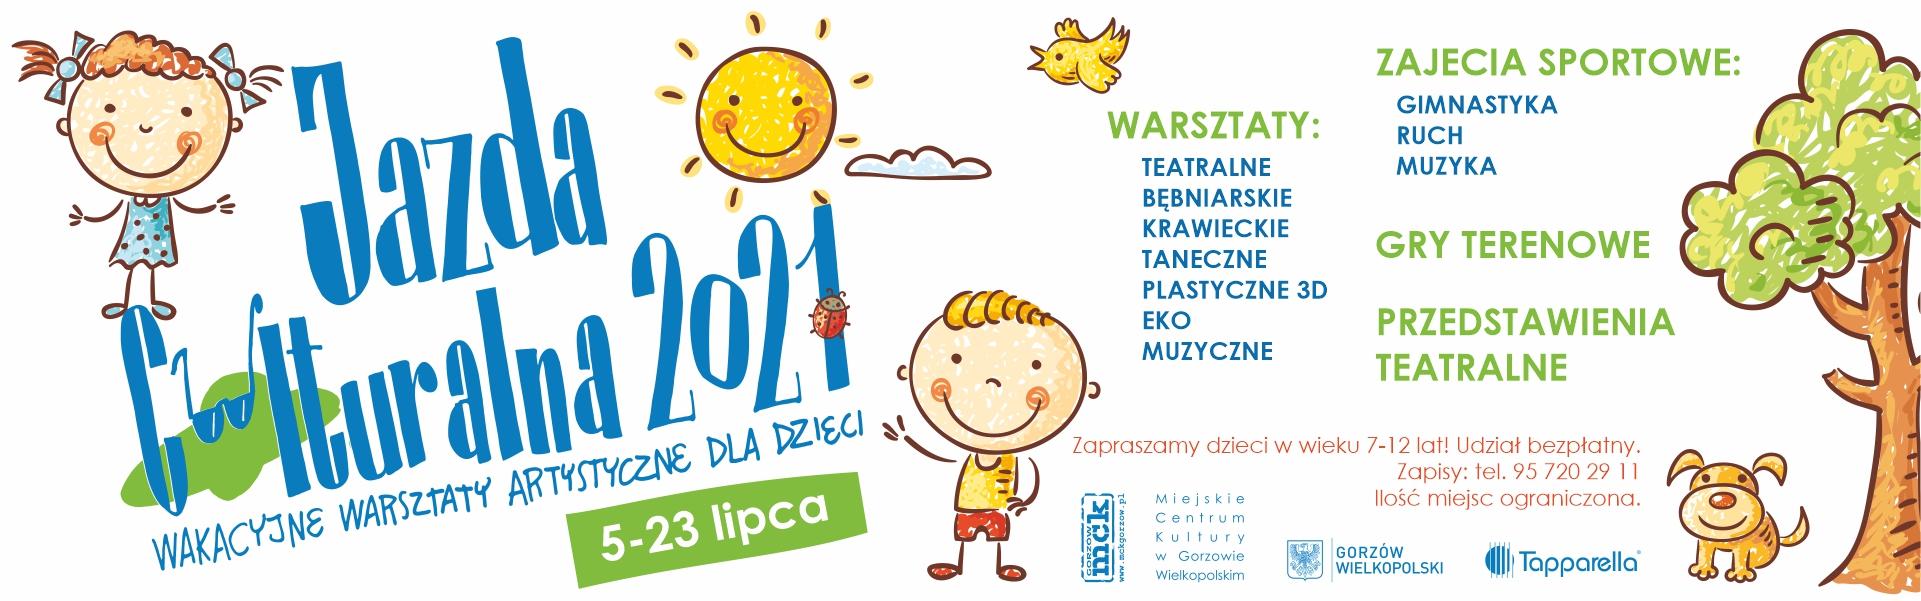 2021 Jazda Coolturalna baner www